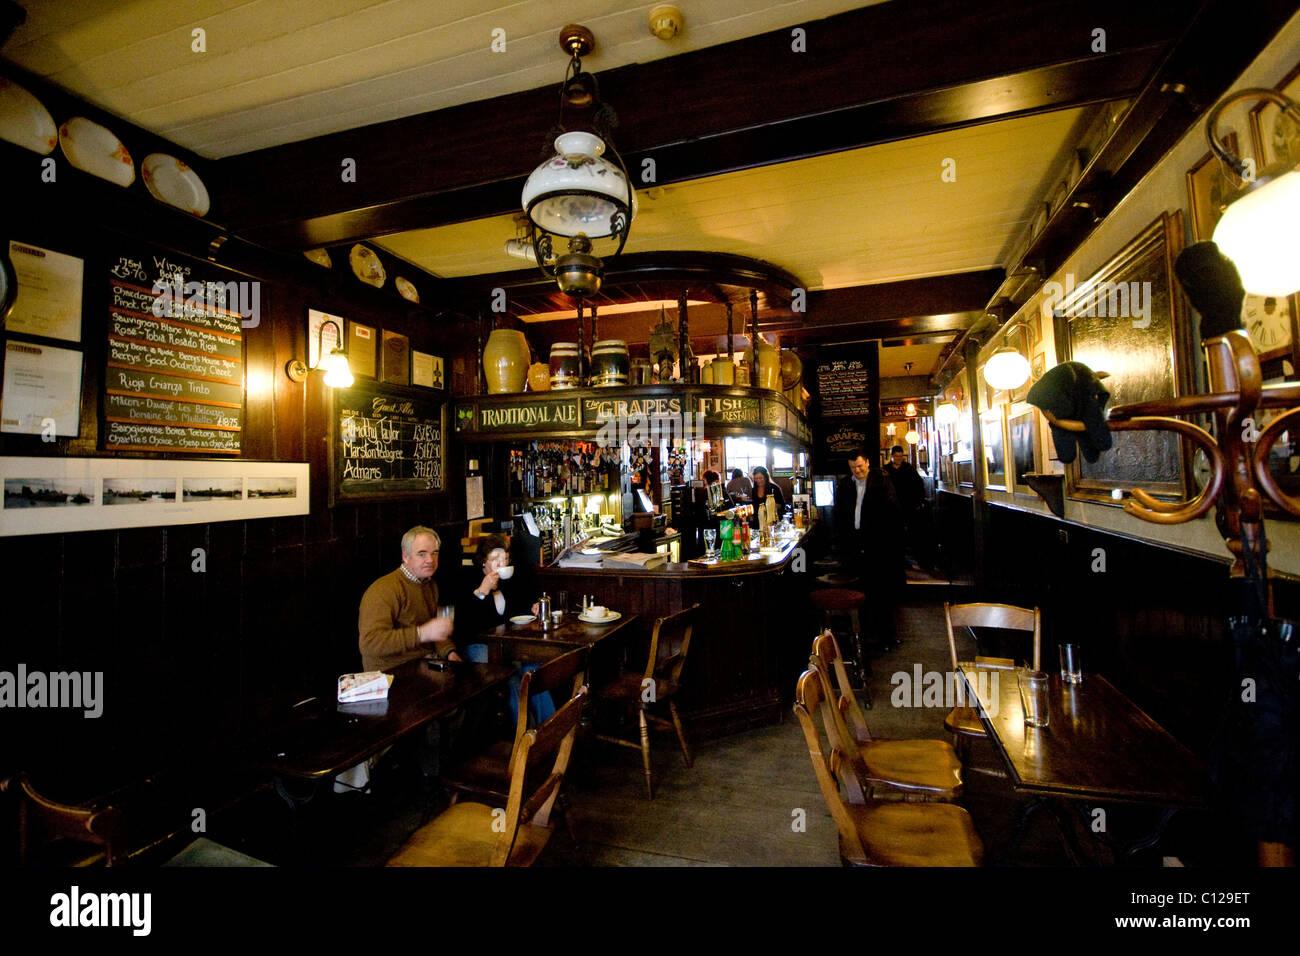 Grapes Pub, London, Canary wharf, UK - Stock Image